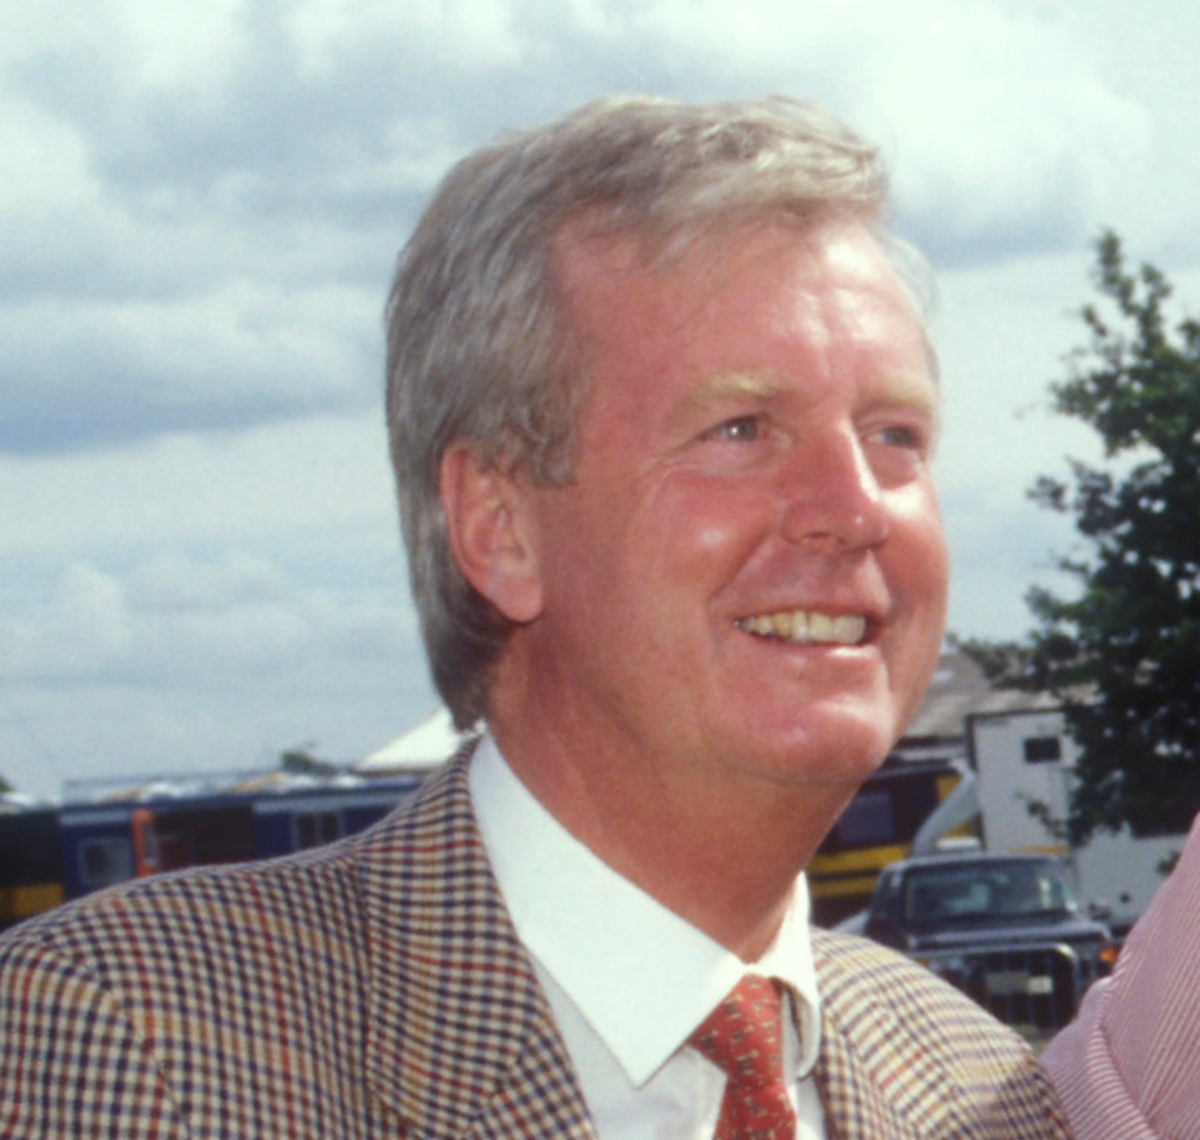 Michael Bullman has passed away aged 72 ©Kit Houghton/FEI